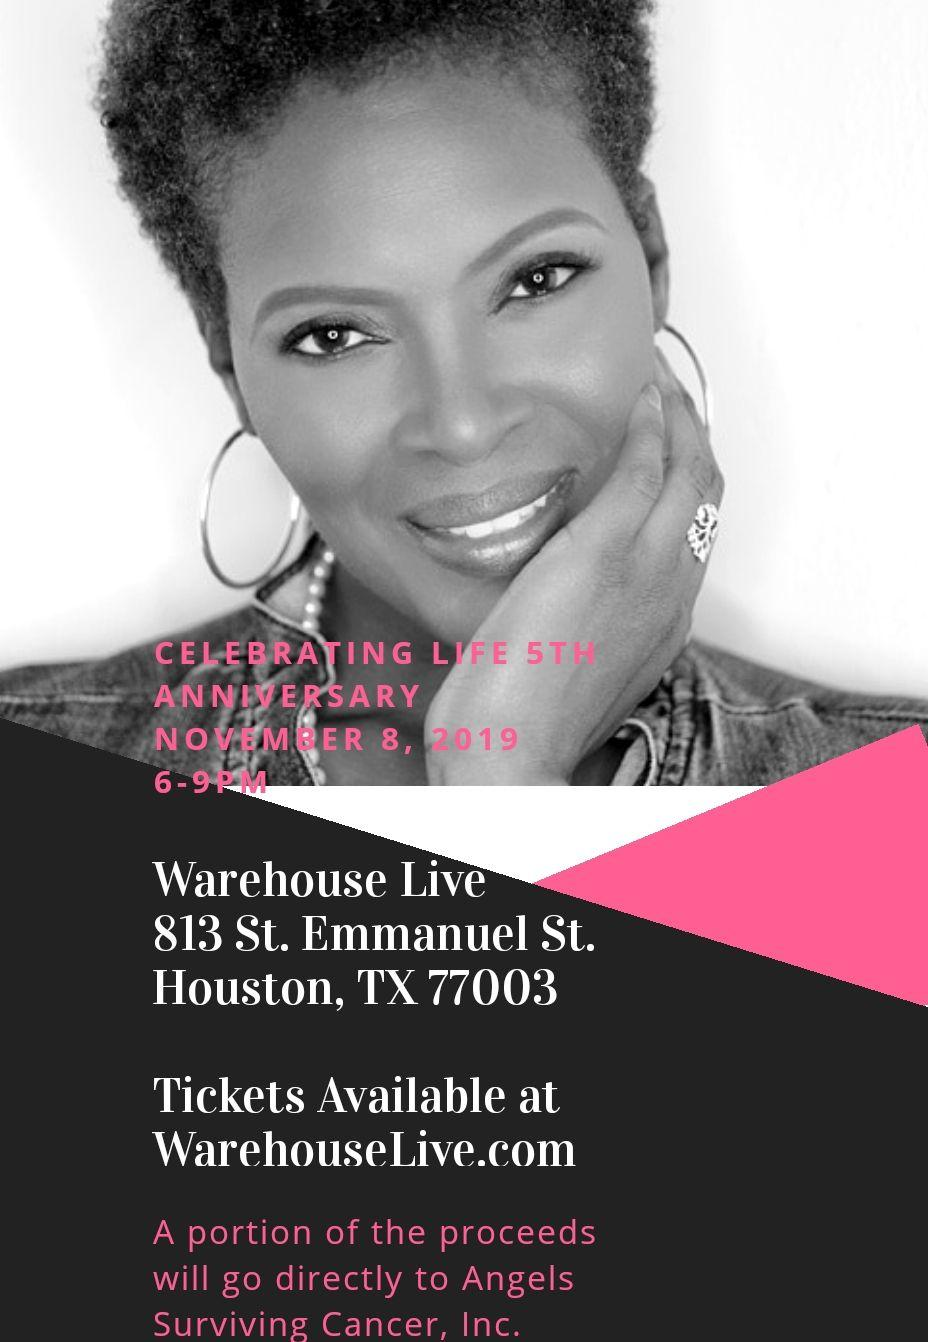 Esther M. Lewis  Celebration of Life - Anniversary #5